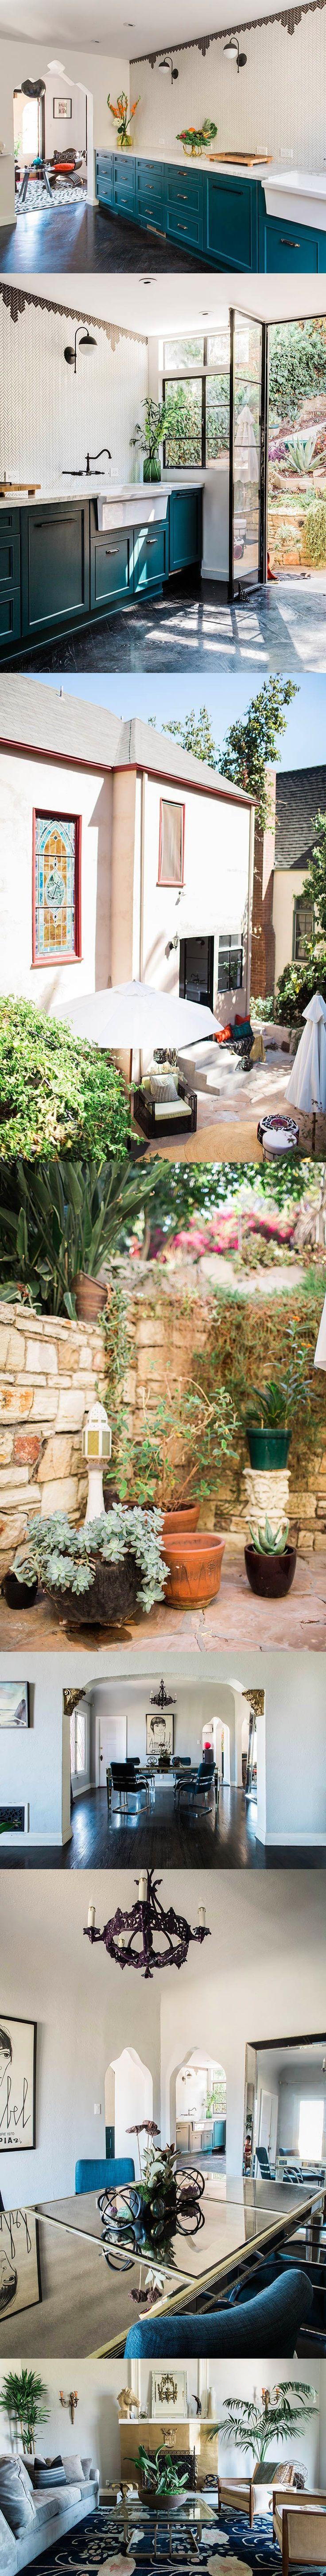 Candis Cayne muestra su casa / http://www.designsponge.com